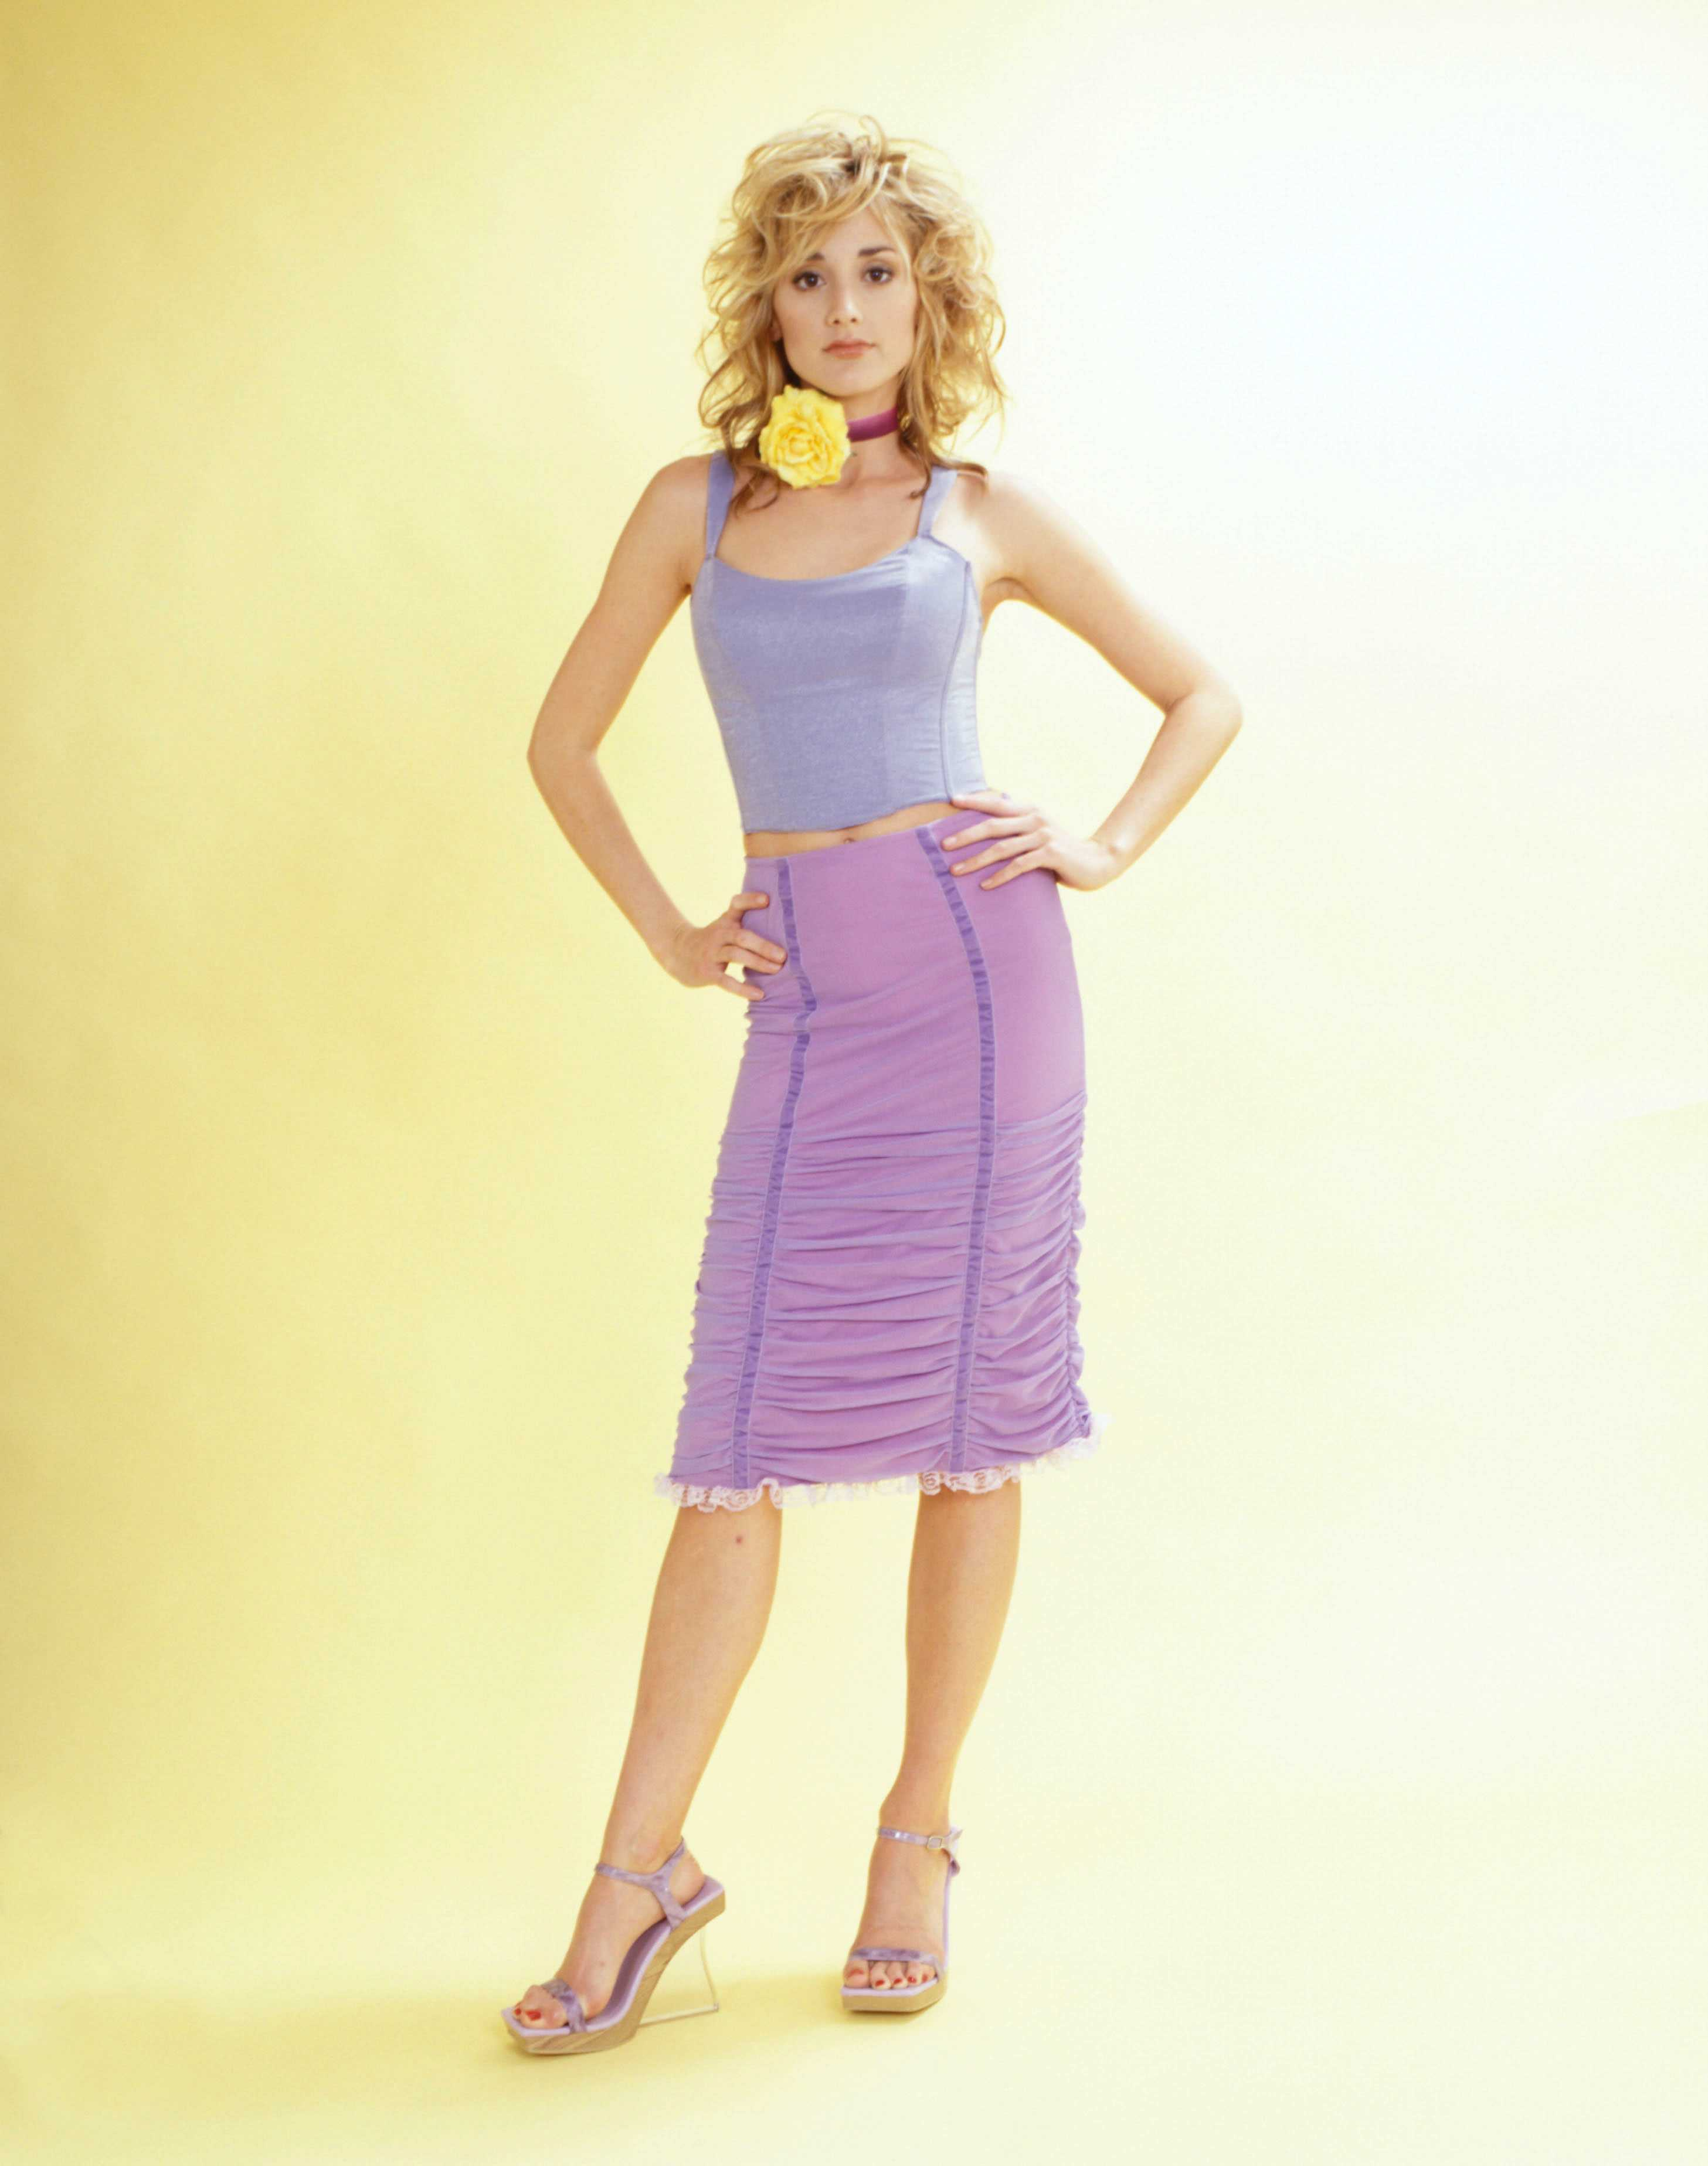 Bree Turner sexy legs